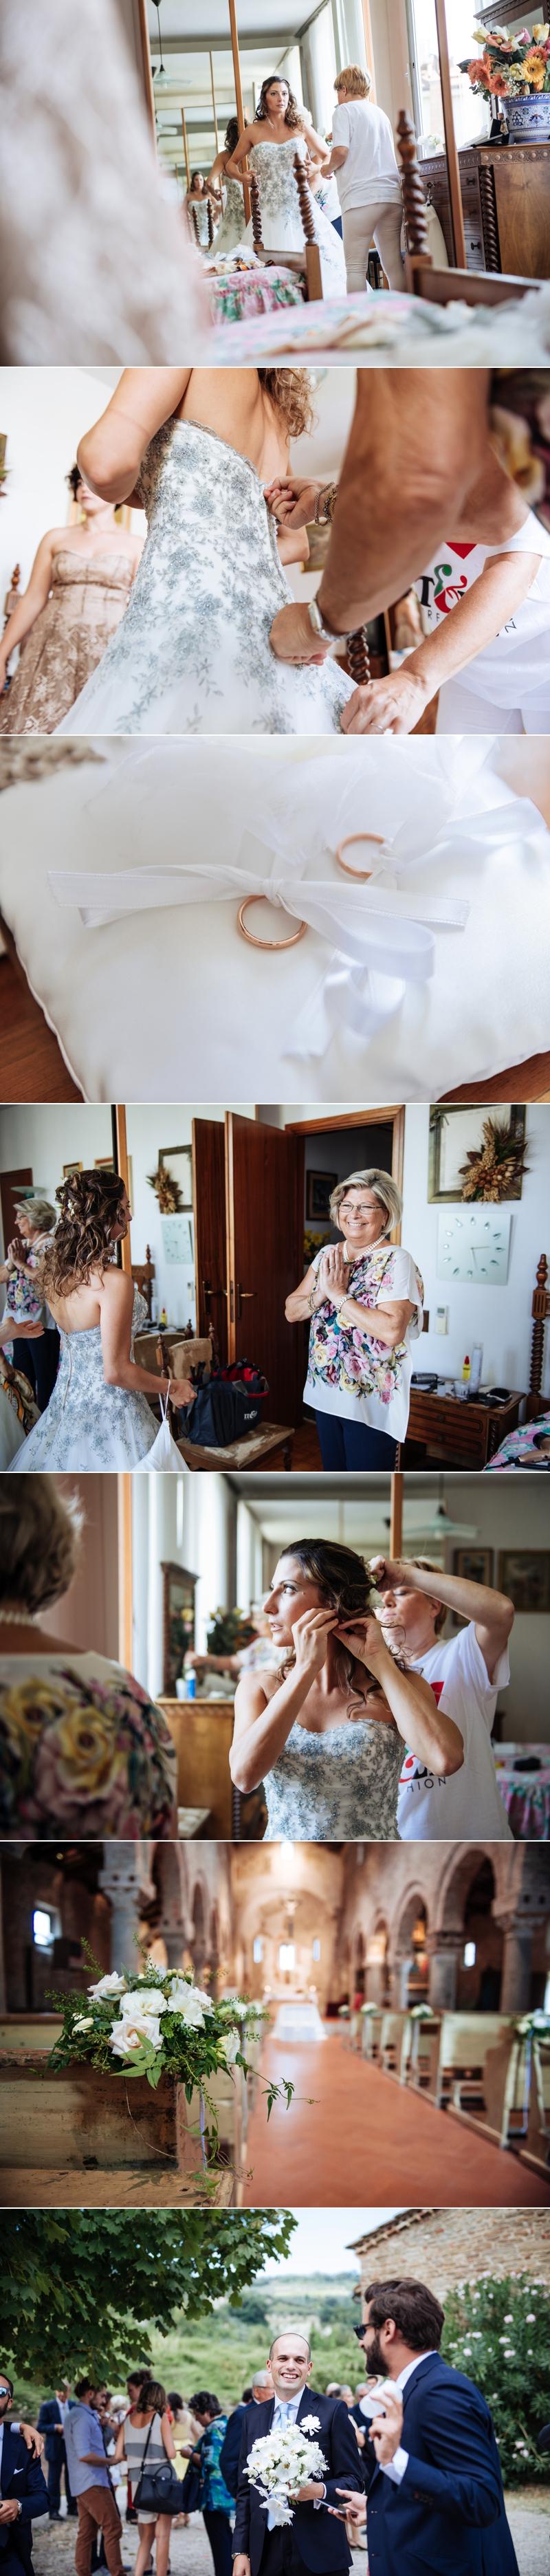 Fotografo Matrimonio Pieve del Tho Brisighella Monastero Scardavilla Meldola Valentina Cavallini 5